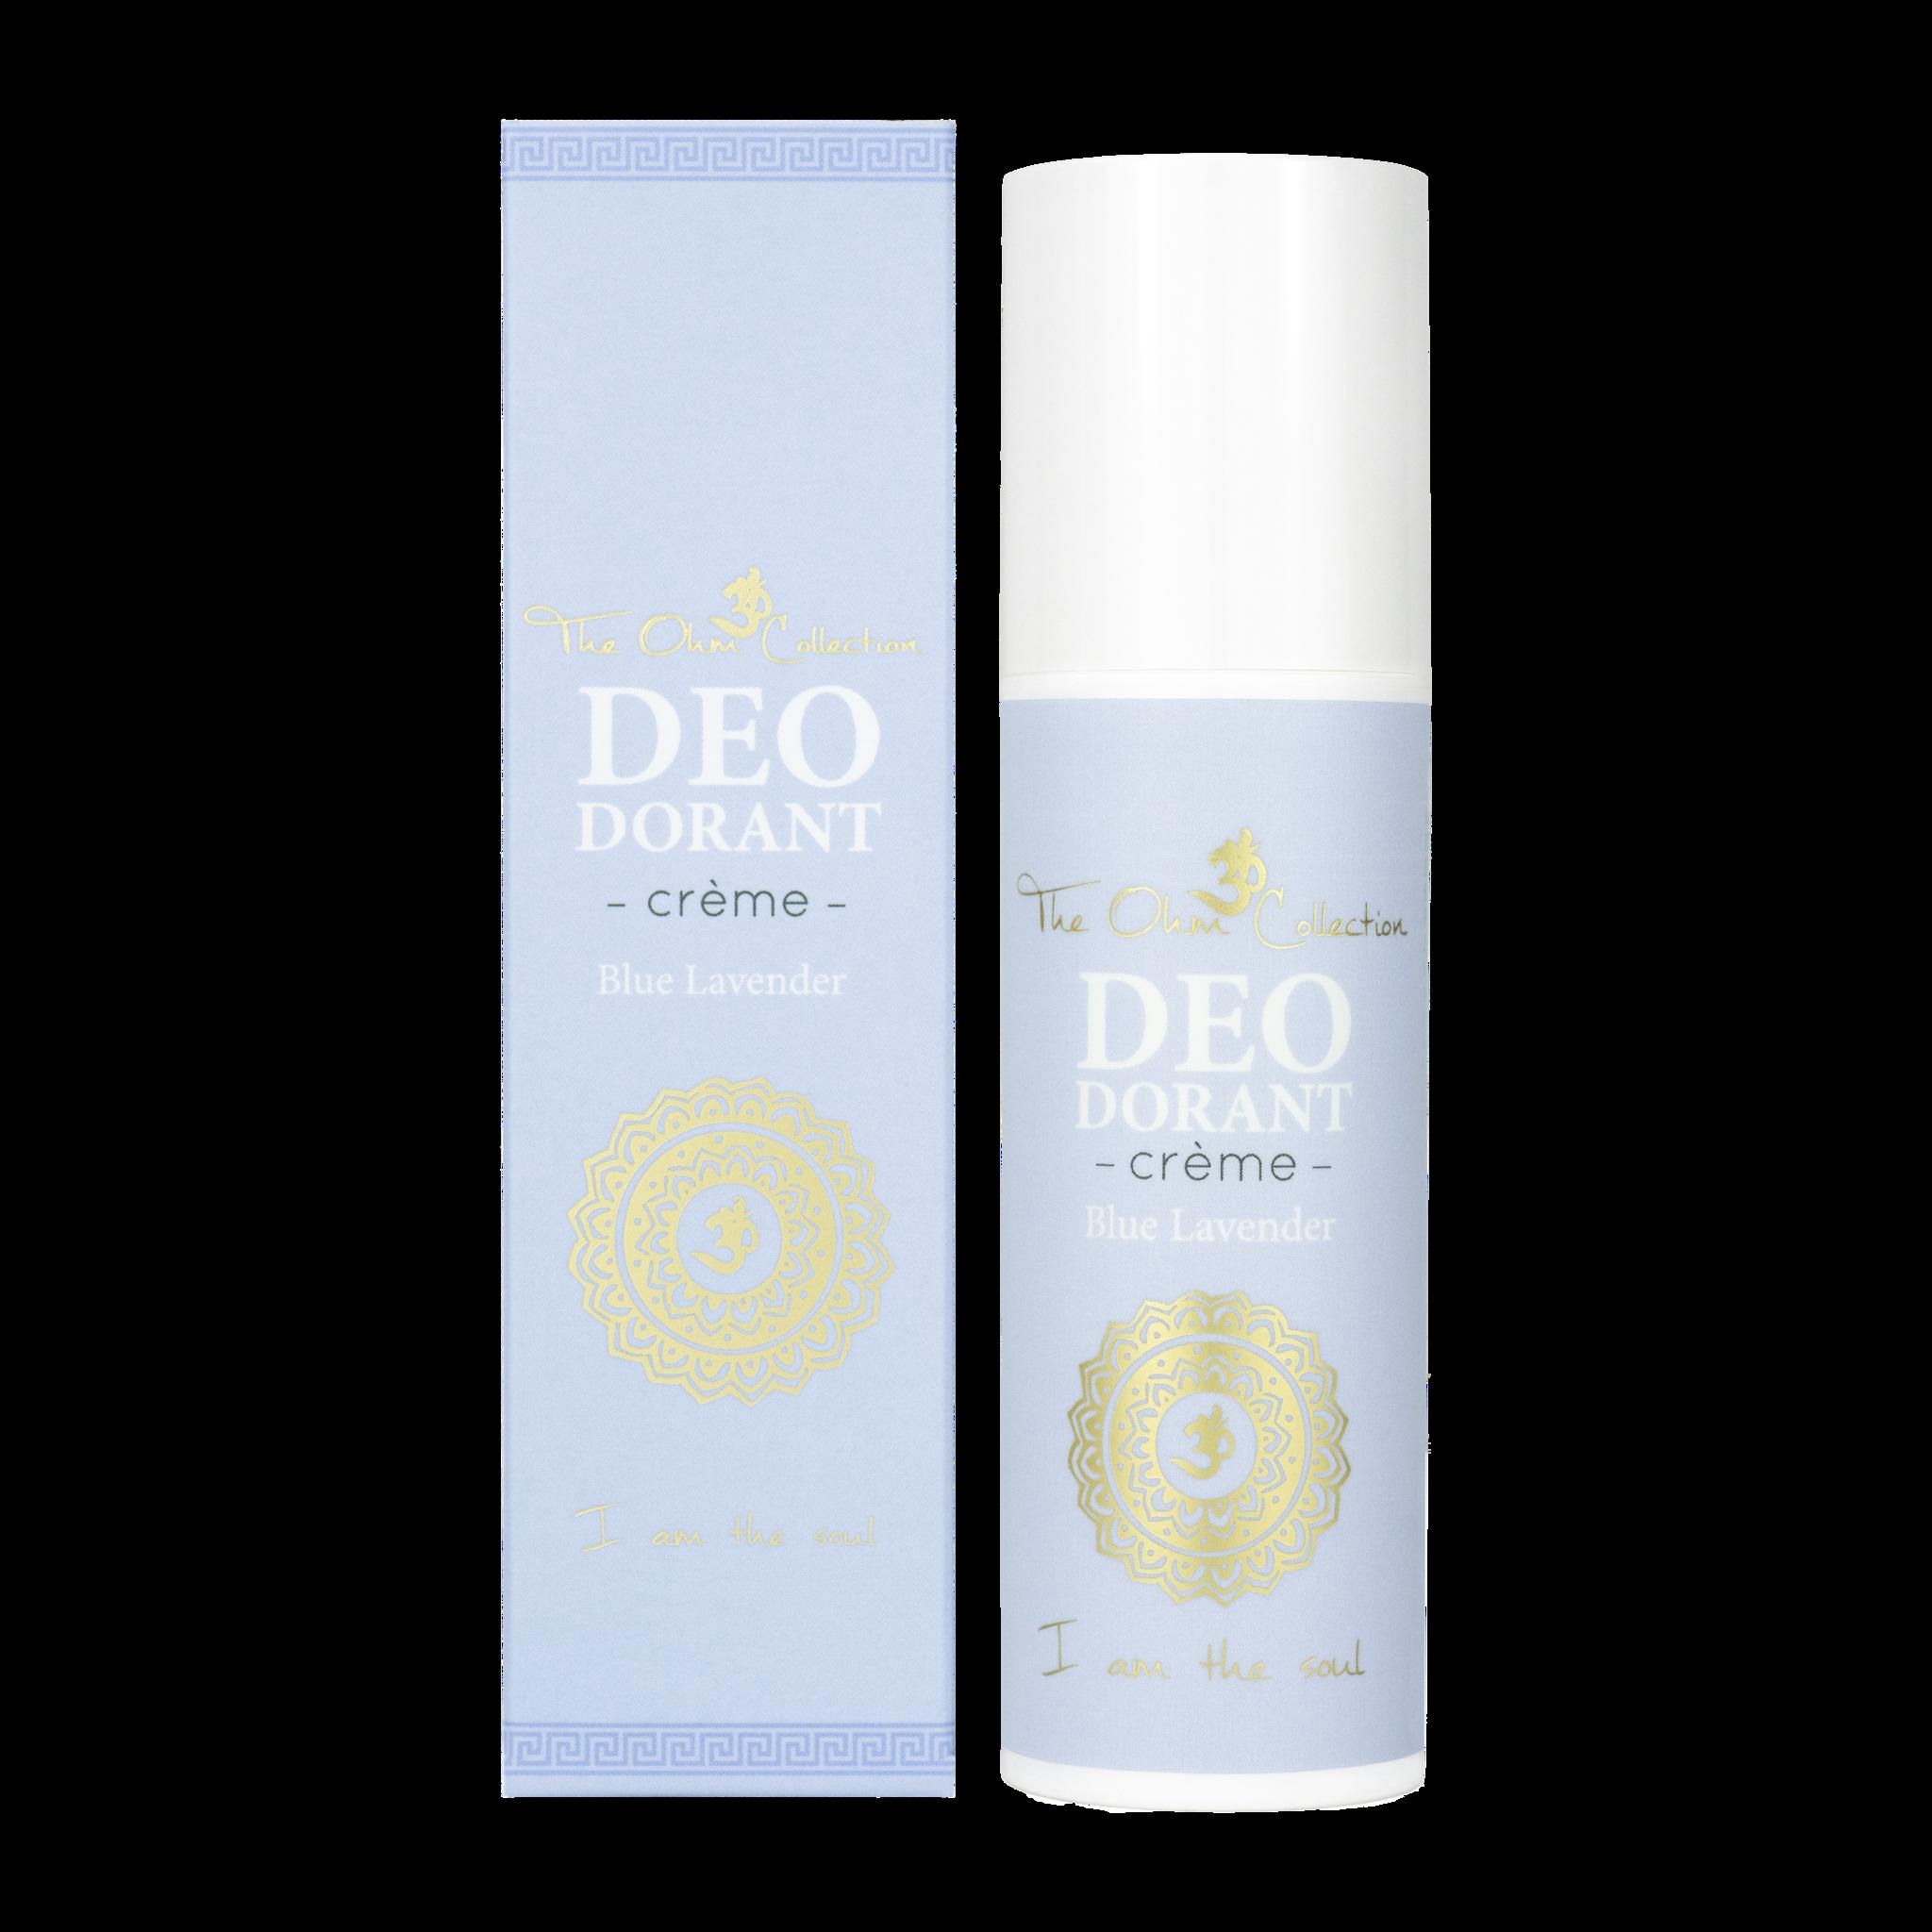 The Ohm Collection Deodorant Crème Blue Lavender